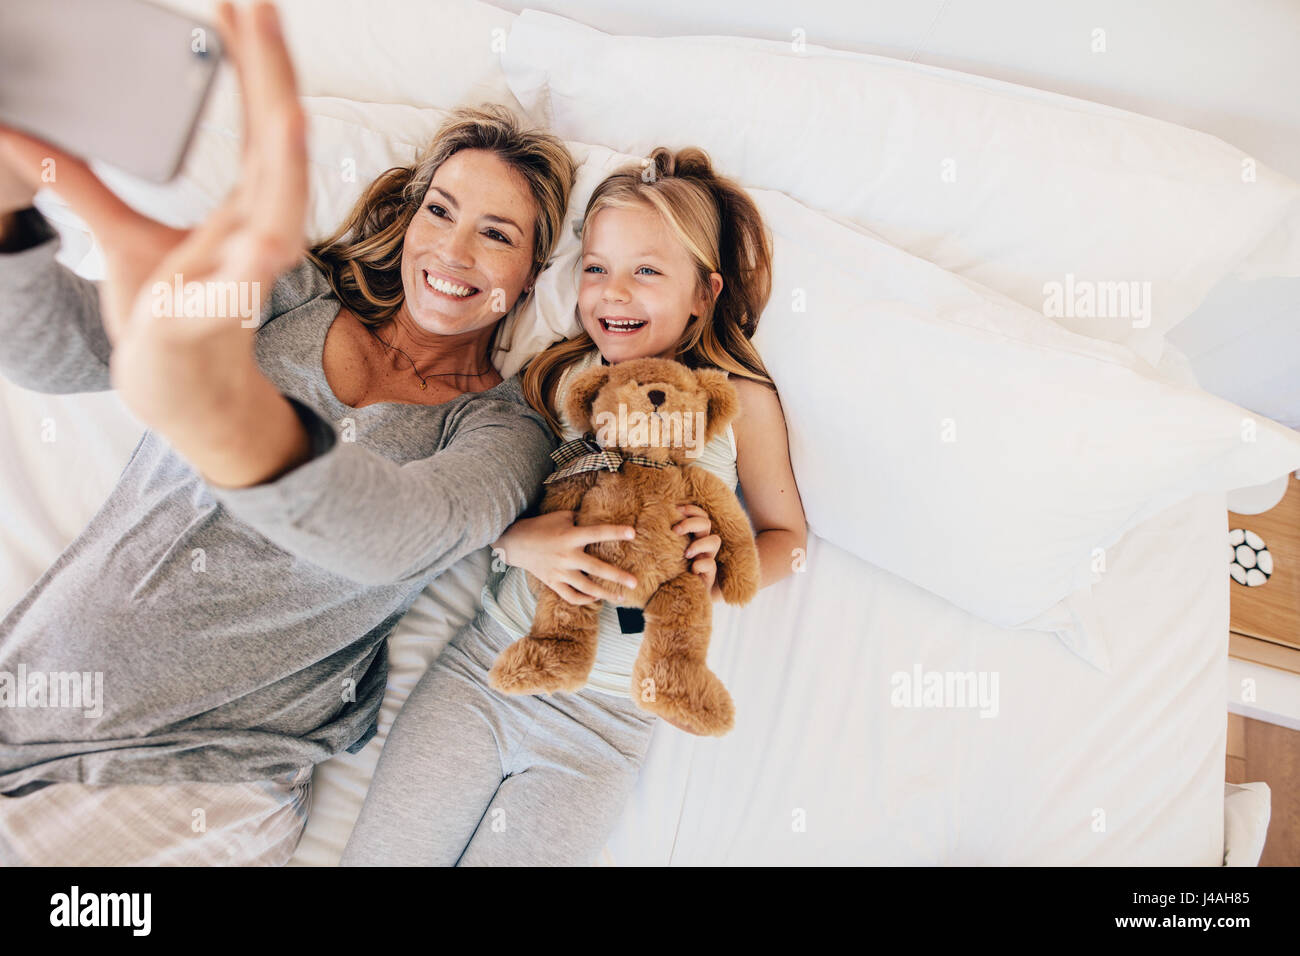 Vue d'en haut photo de Young family en tenant avec selfies smartphone dans le lit. Mother and Daughter lying Photo Stock